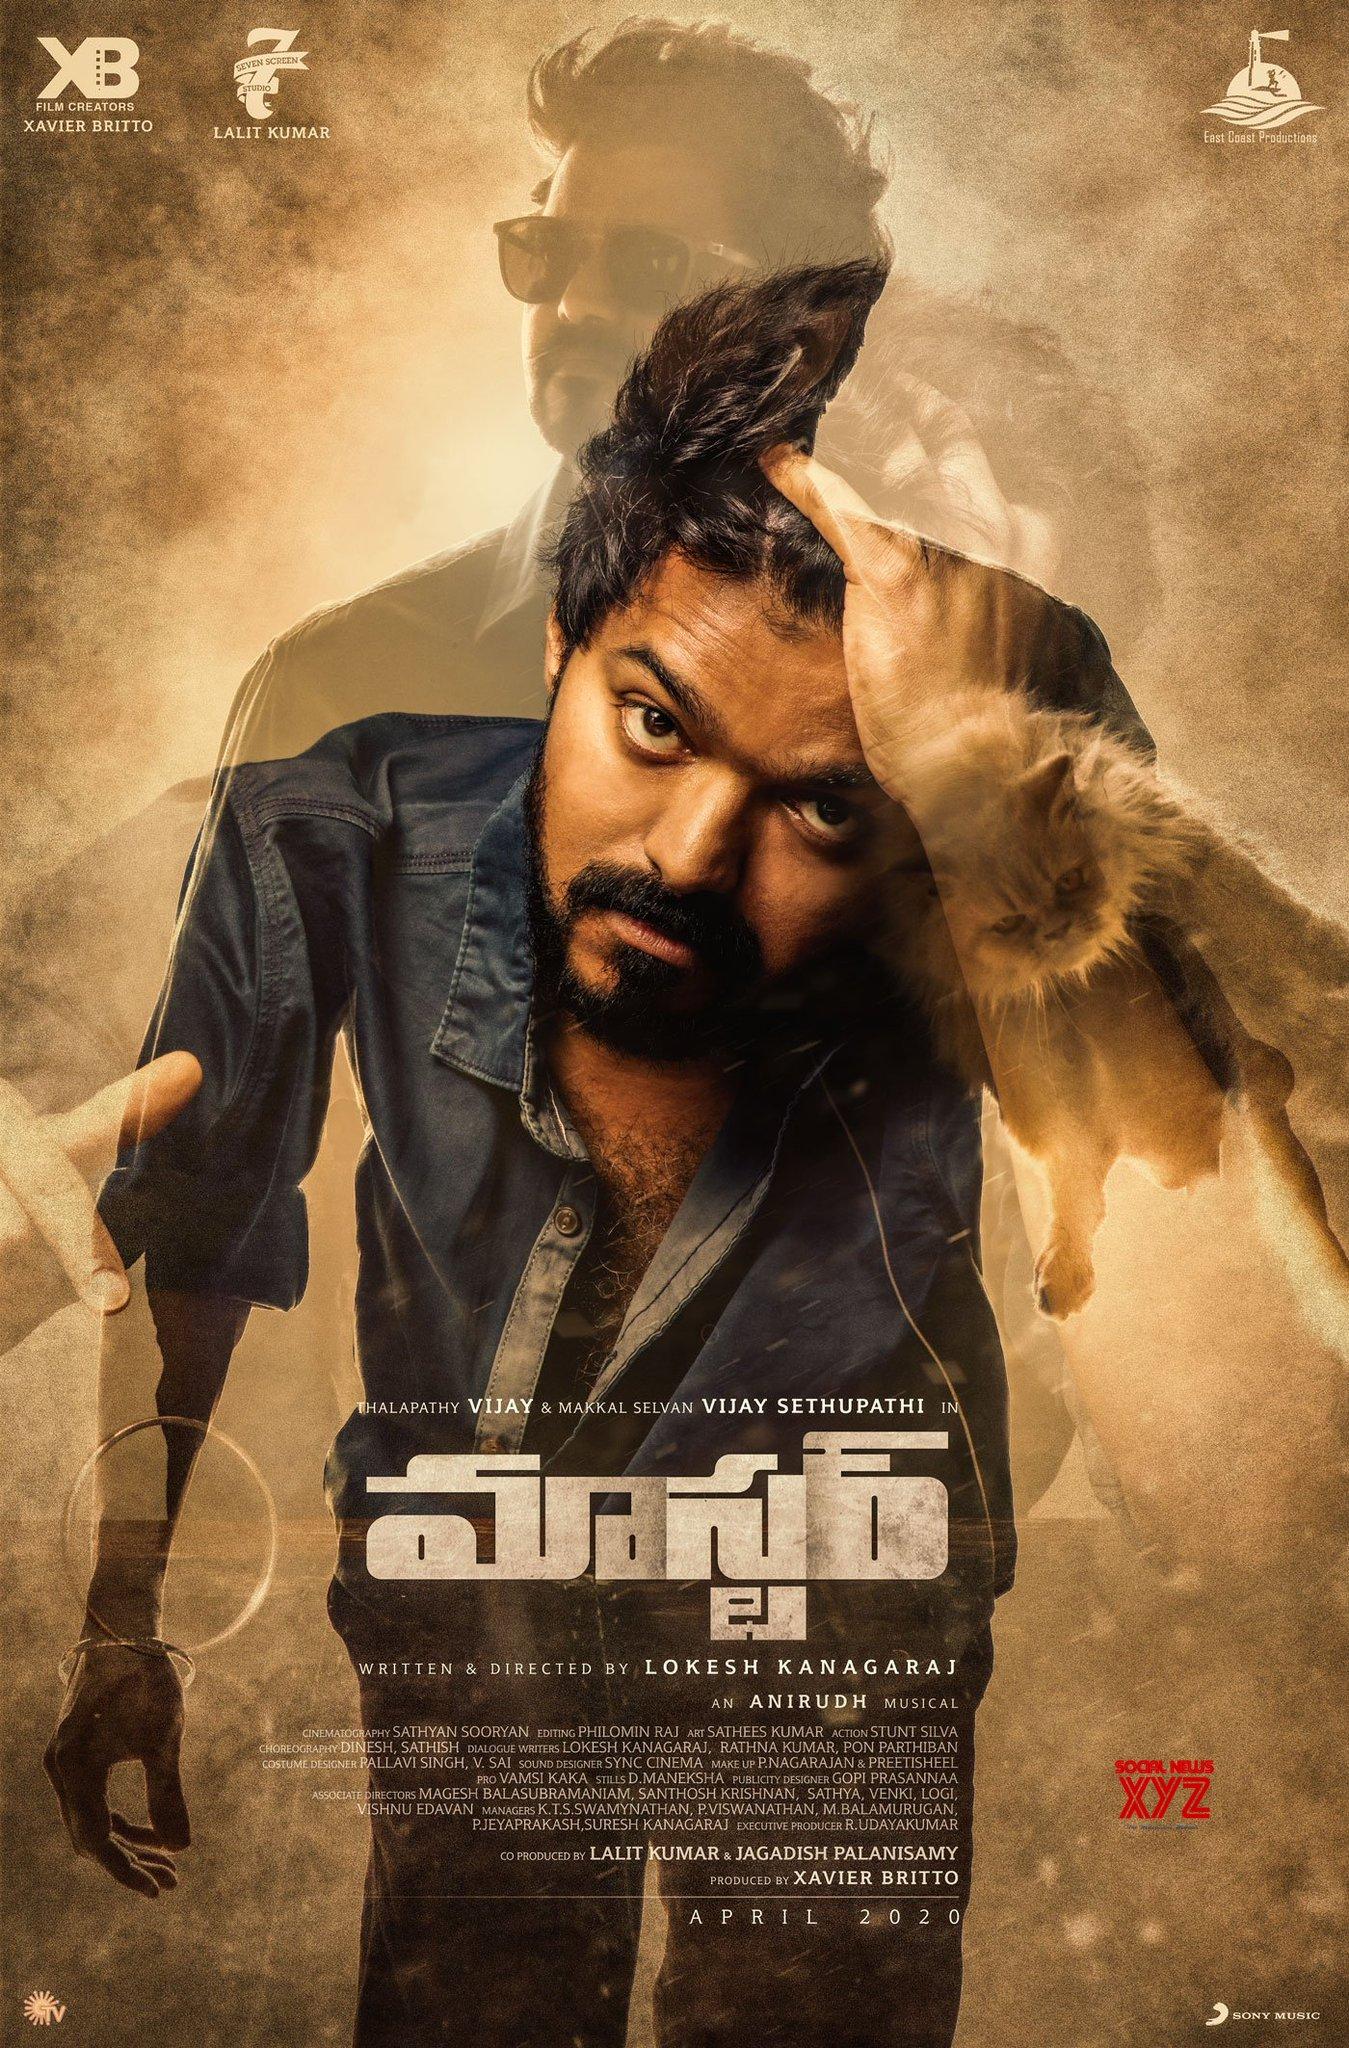 Thalapathy Vijay S Master Movie Telugu And Kannada First Look Posters Social News Xyz